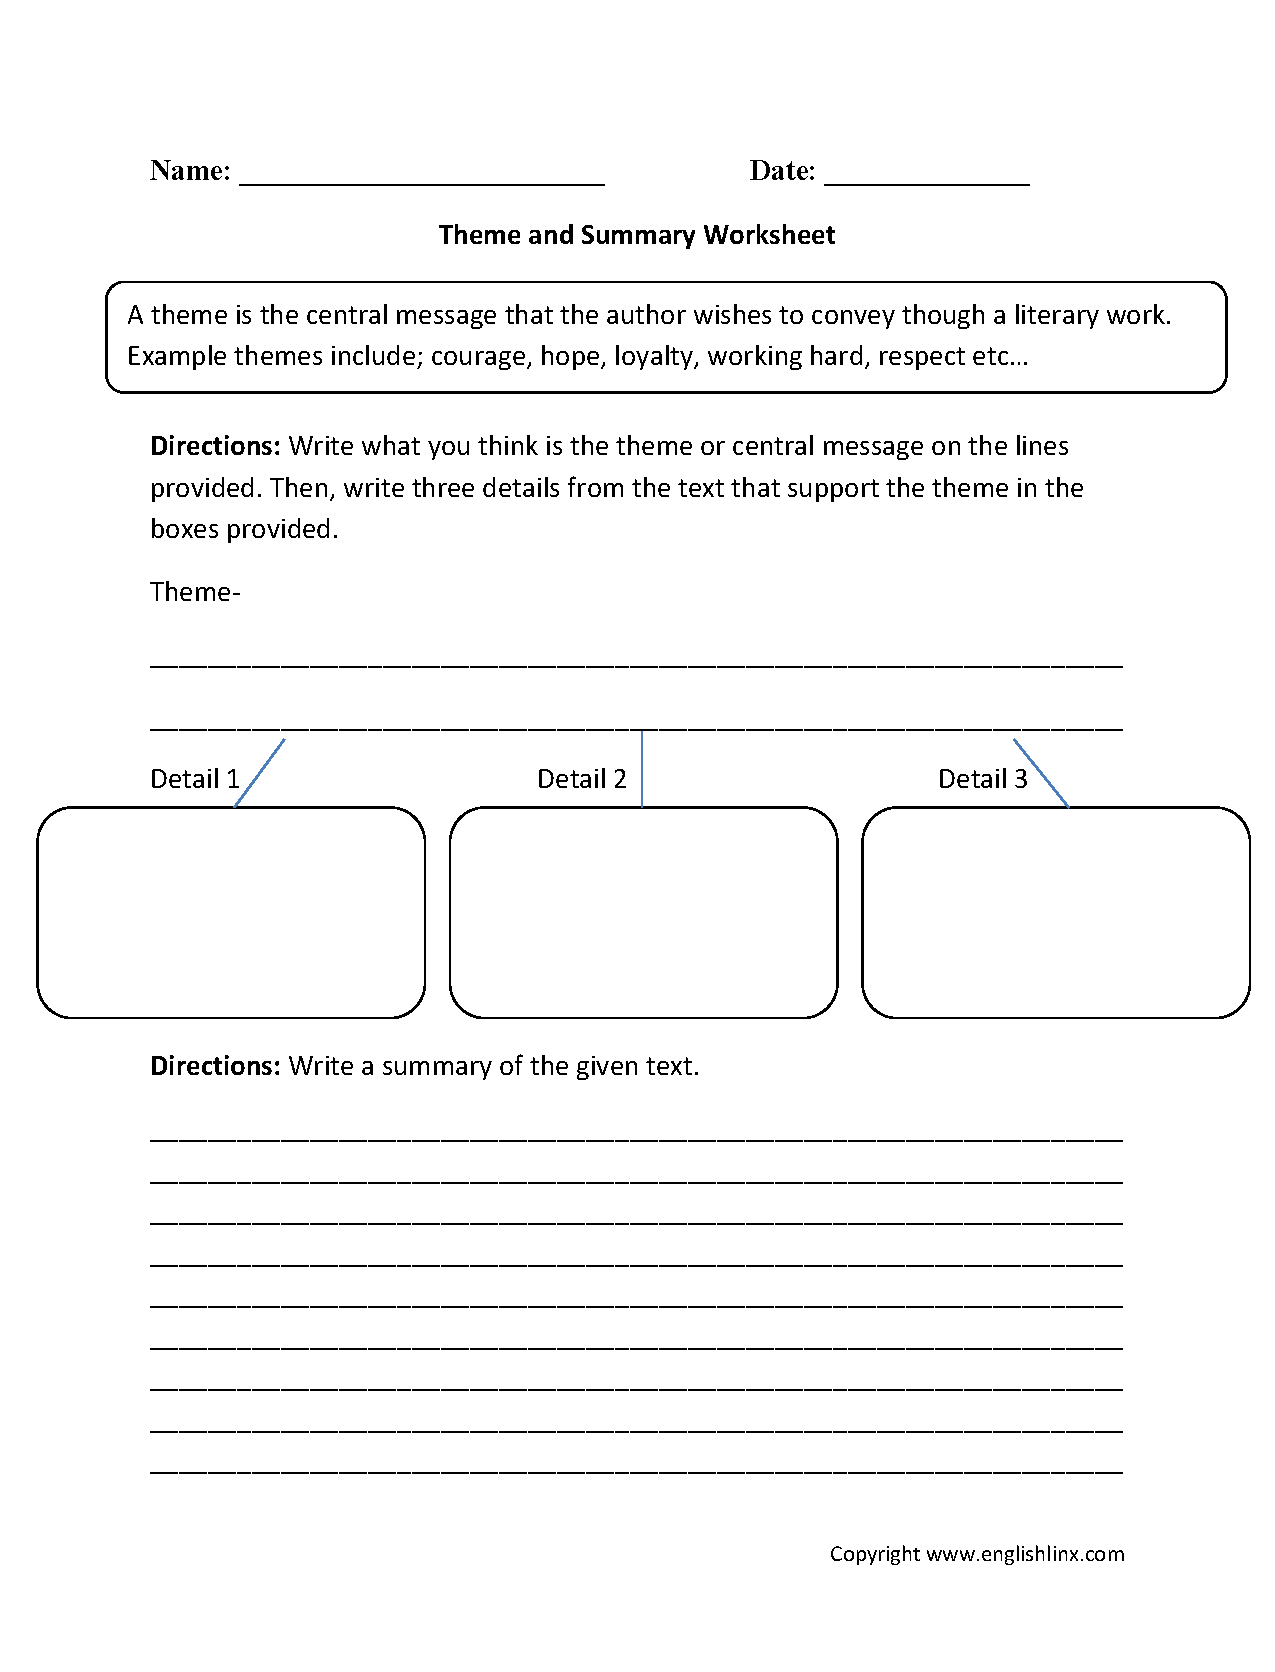 Theme Worksheets   School worksheets [ 1672 x 1275 Pixel ]